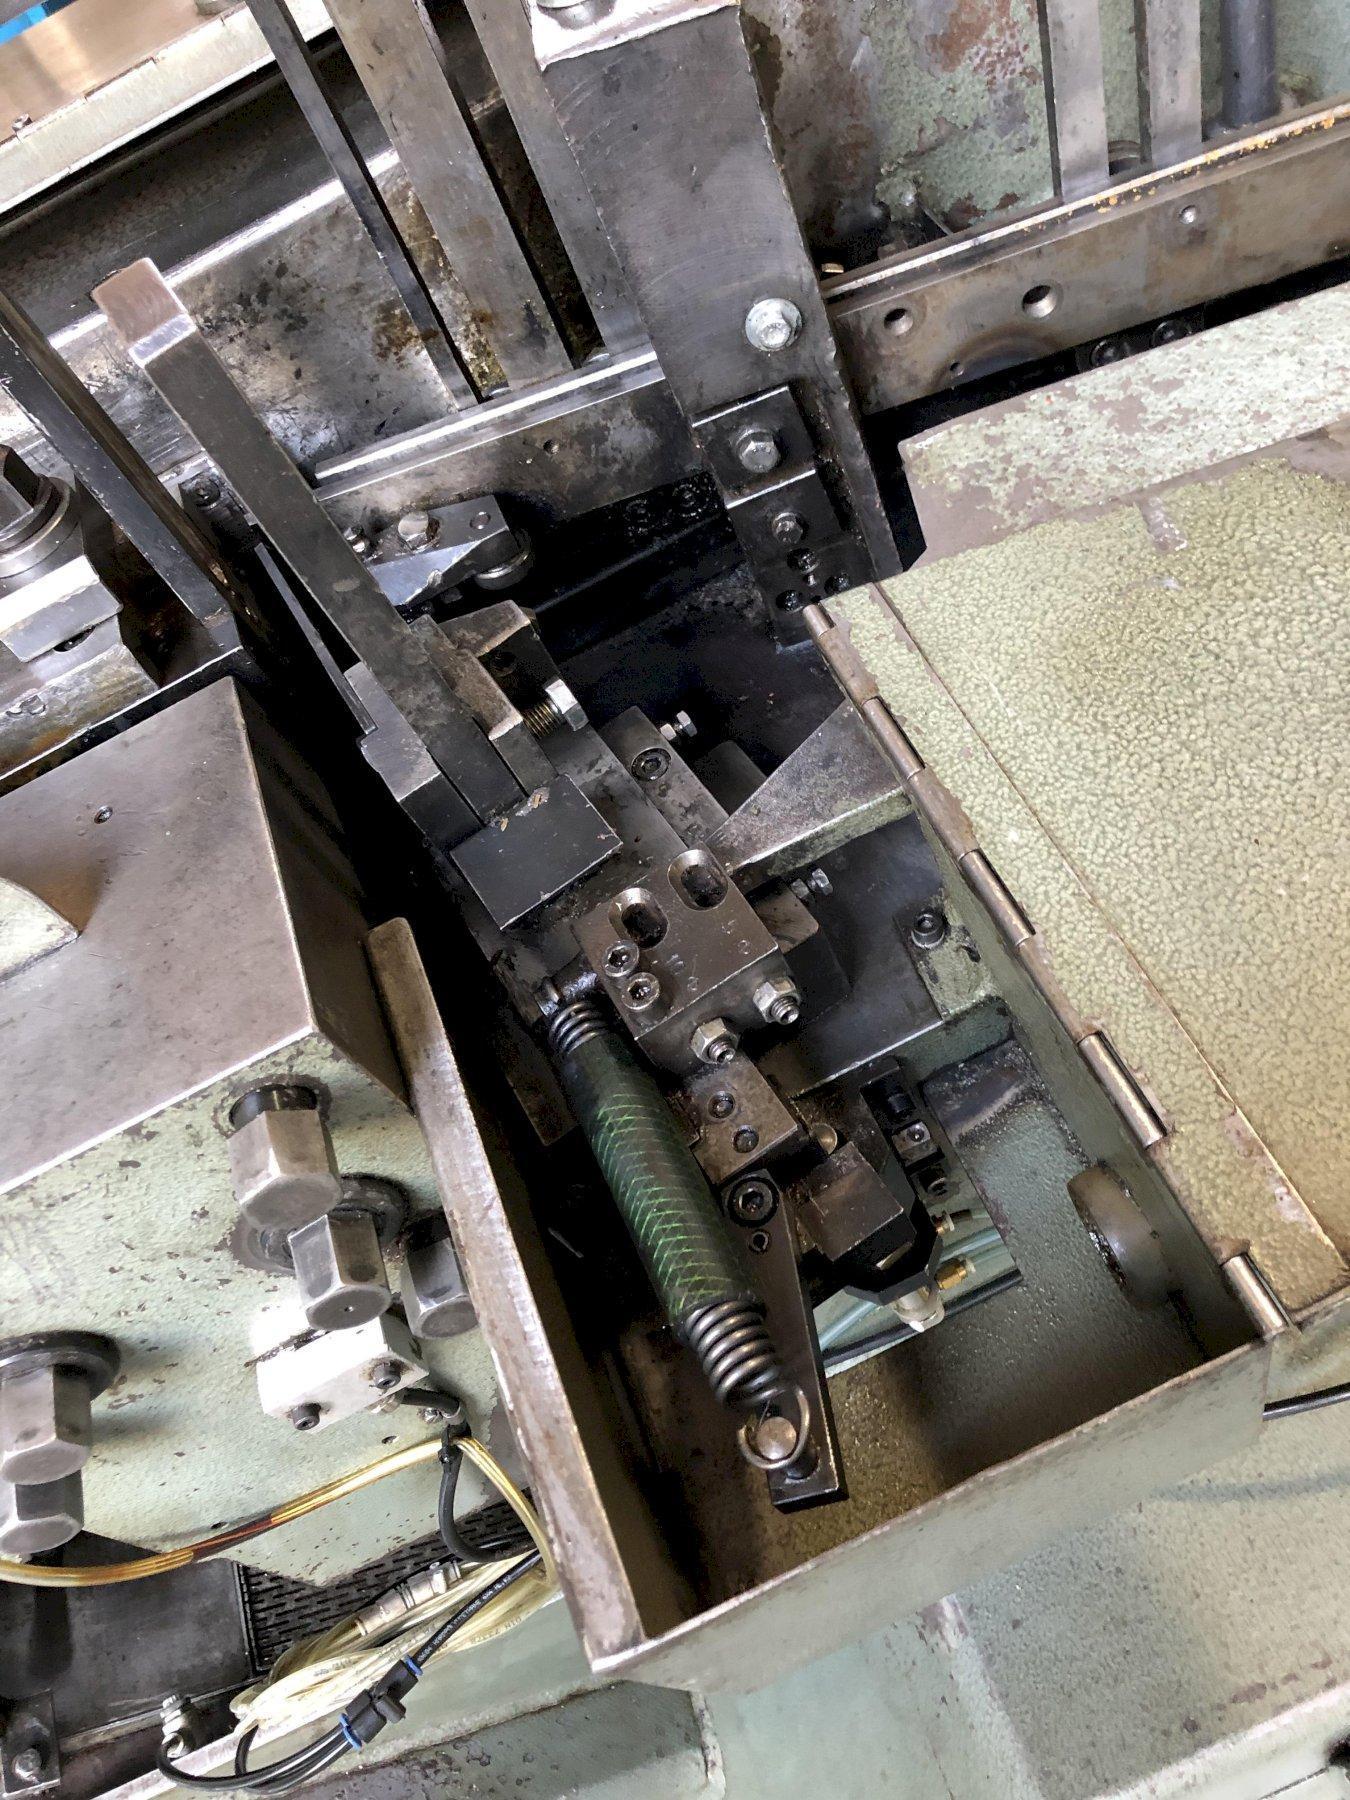 #10/20 E.W. Menn Model GW83 LSX Thread Roller